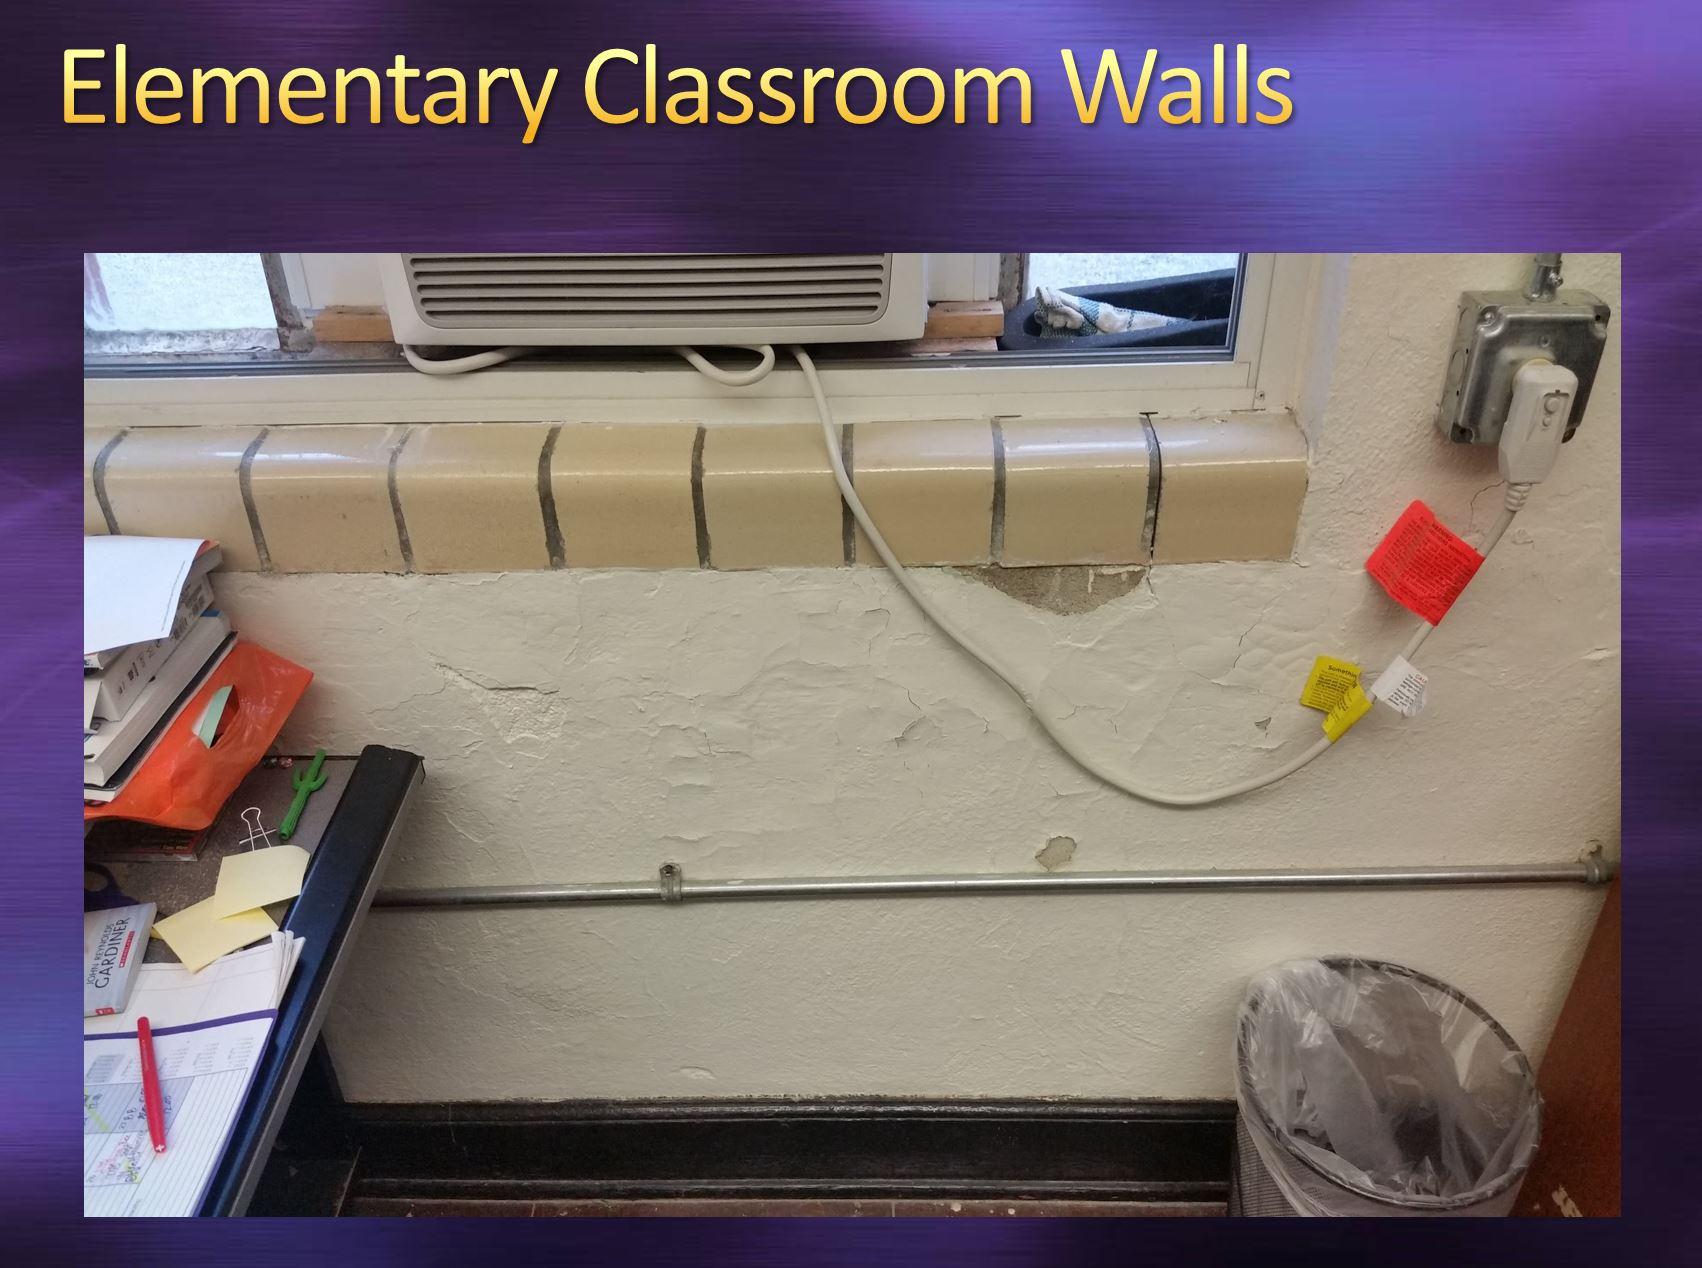 Elementary Classroom Walls